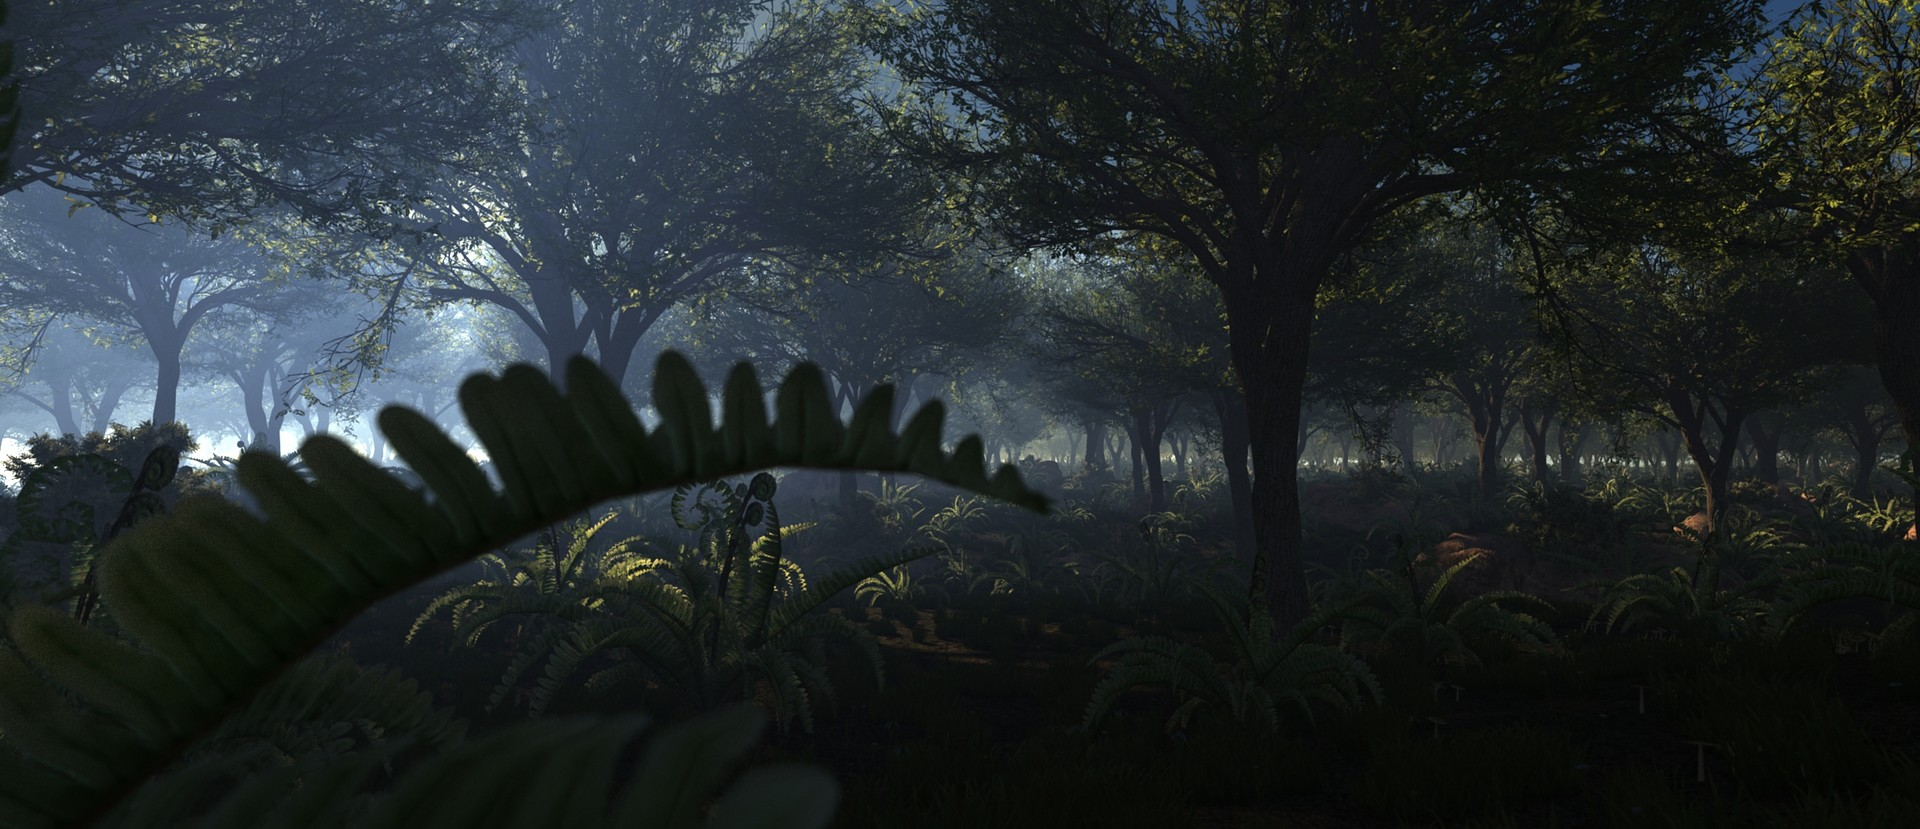 Ezra szigetti plants